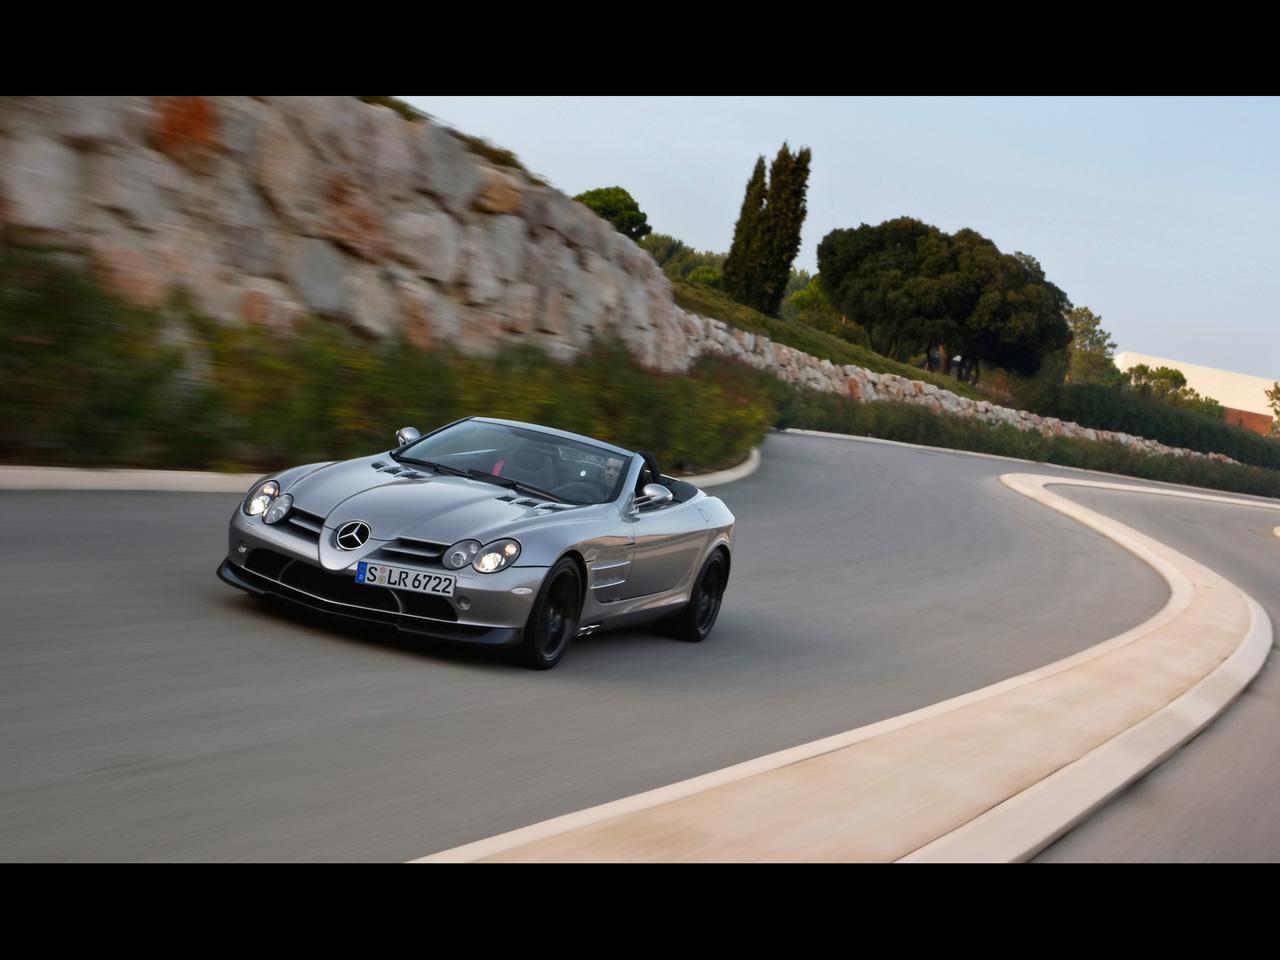 2009-Mercedes-Benz-SLR-McLaren-Roadster-722-S-Front-Angle-Speed-2-1280x960.jpg